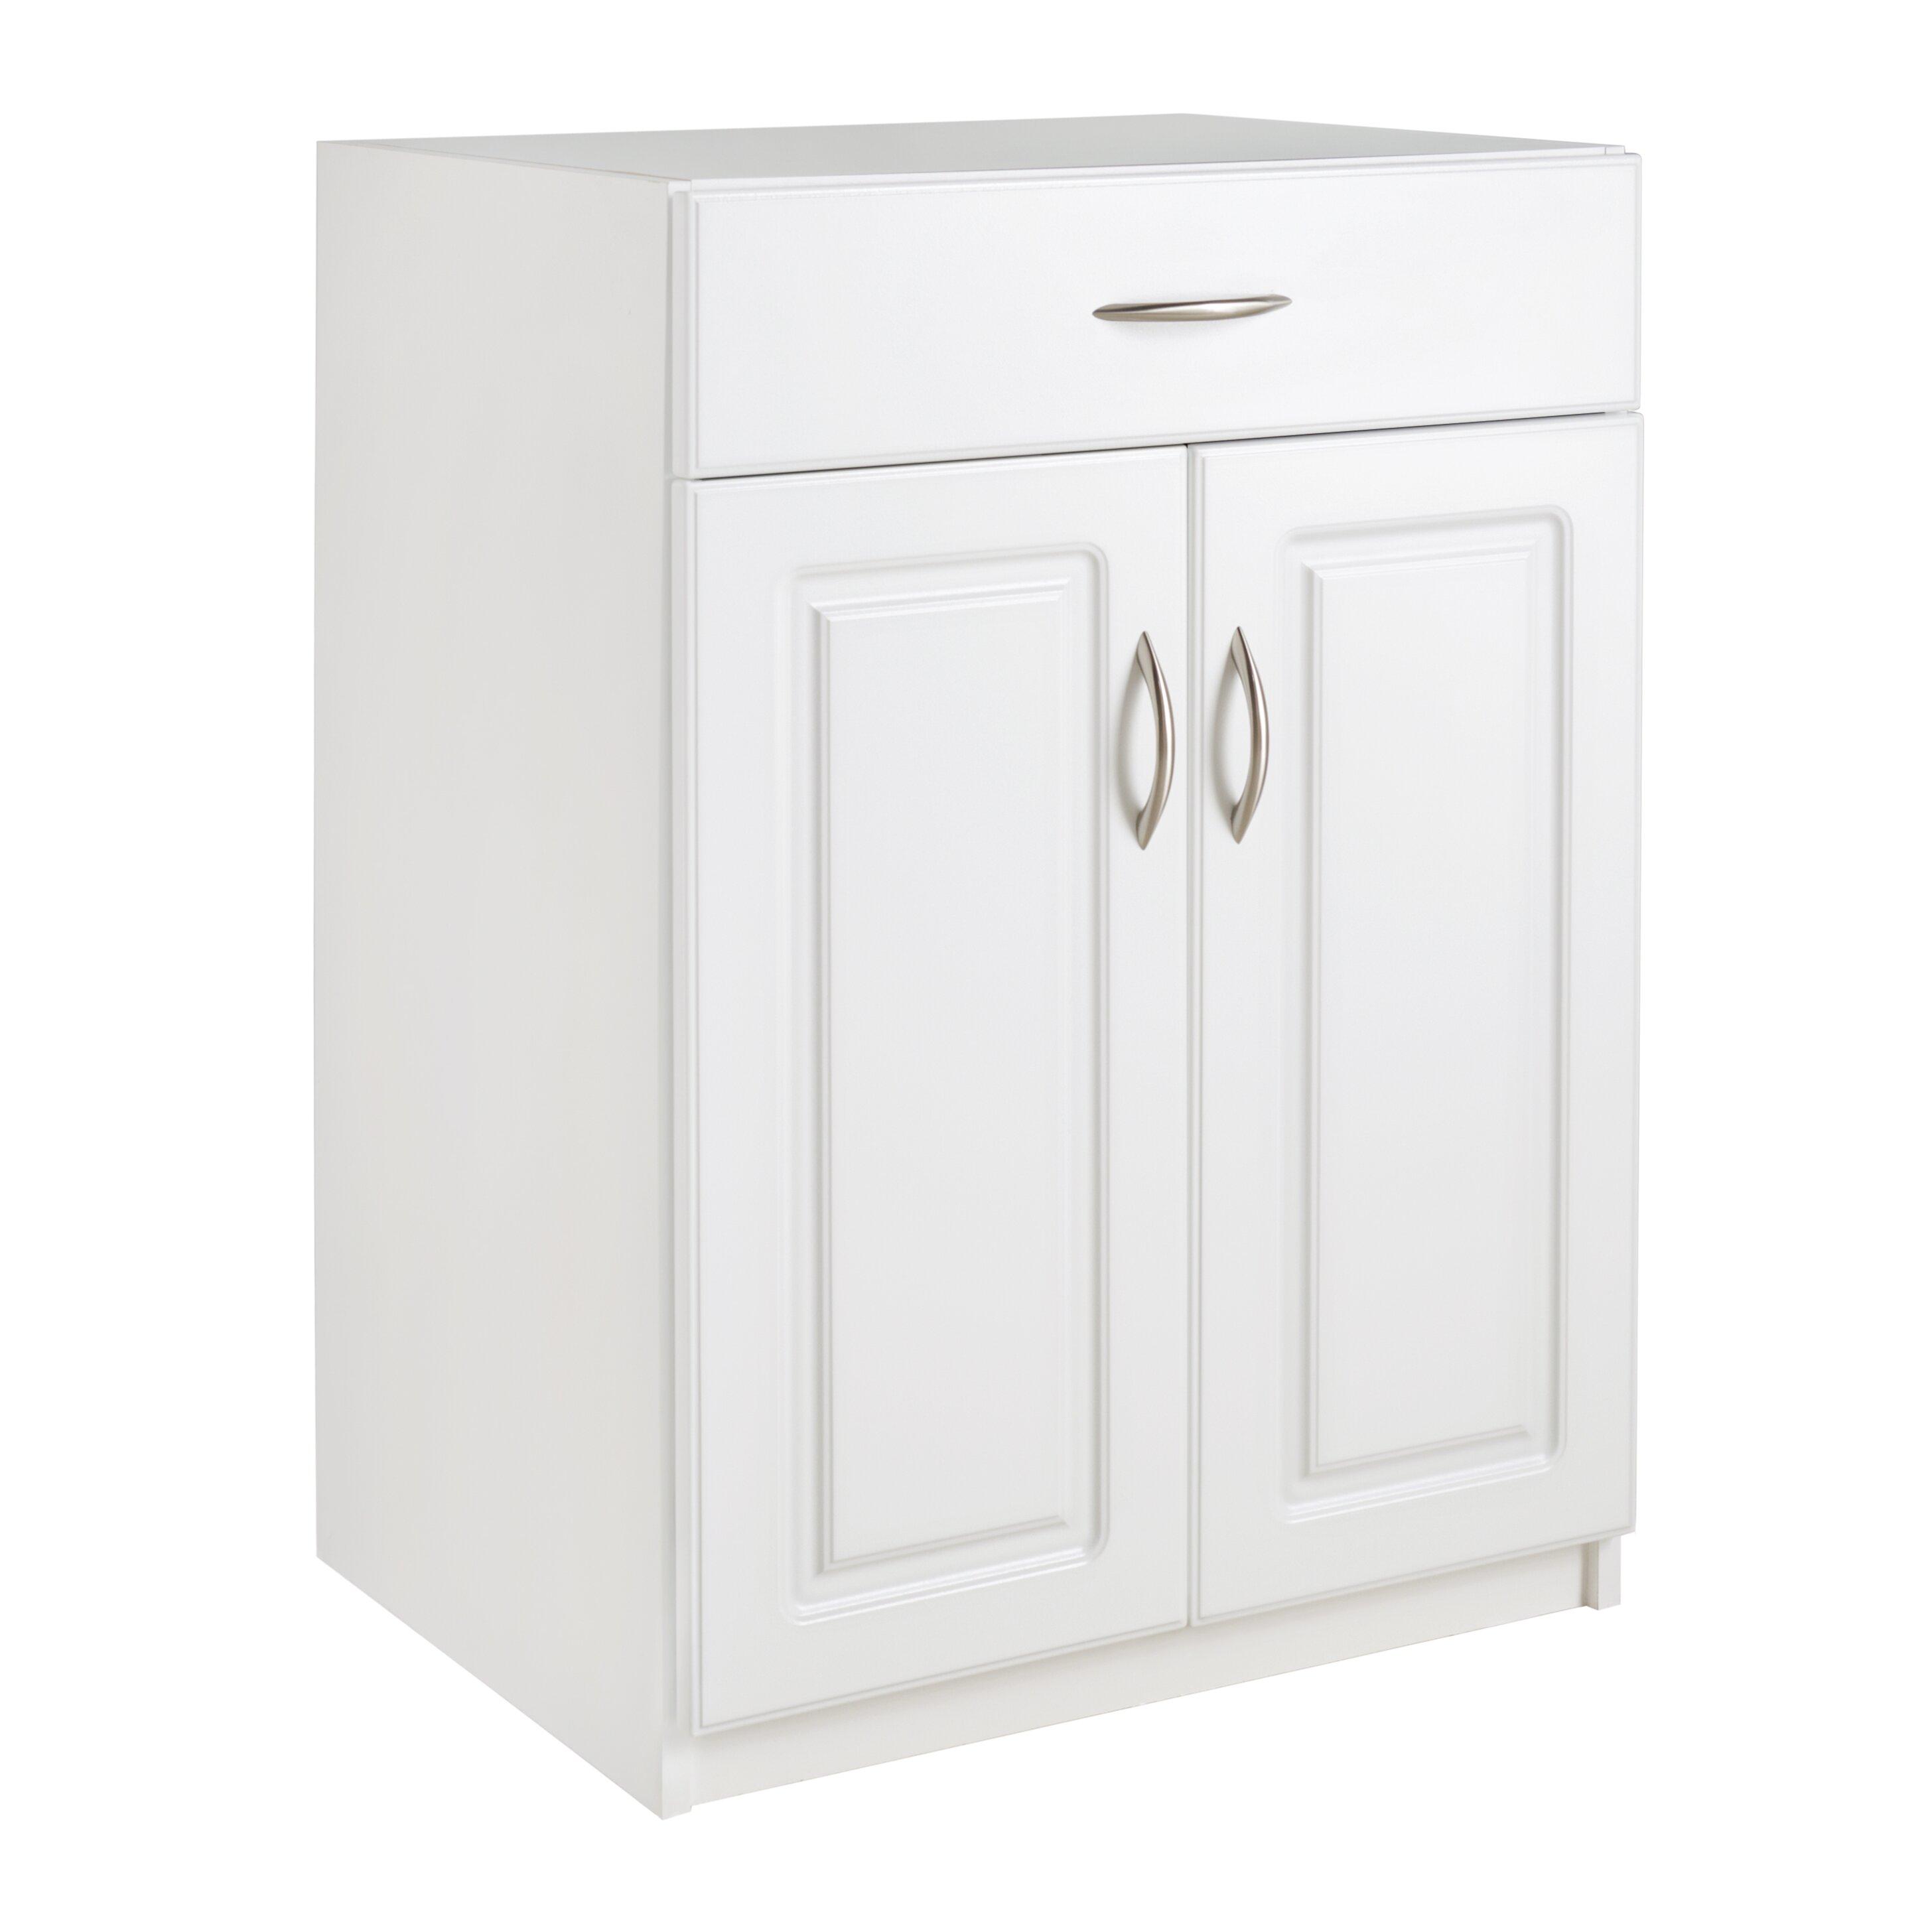 Standard Base Cabinet Dimensions Base Cabinets With Drawers Dimensions Natashainanutshellcom